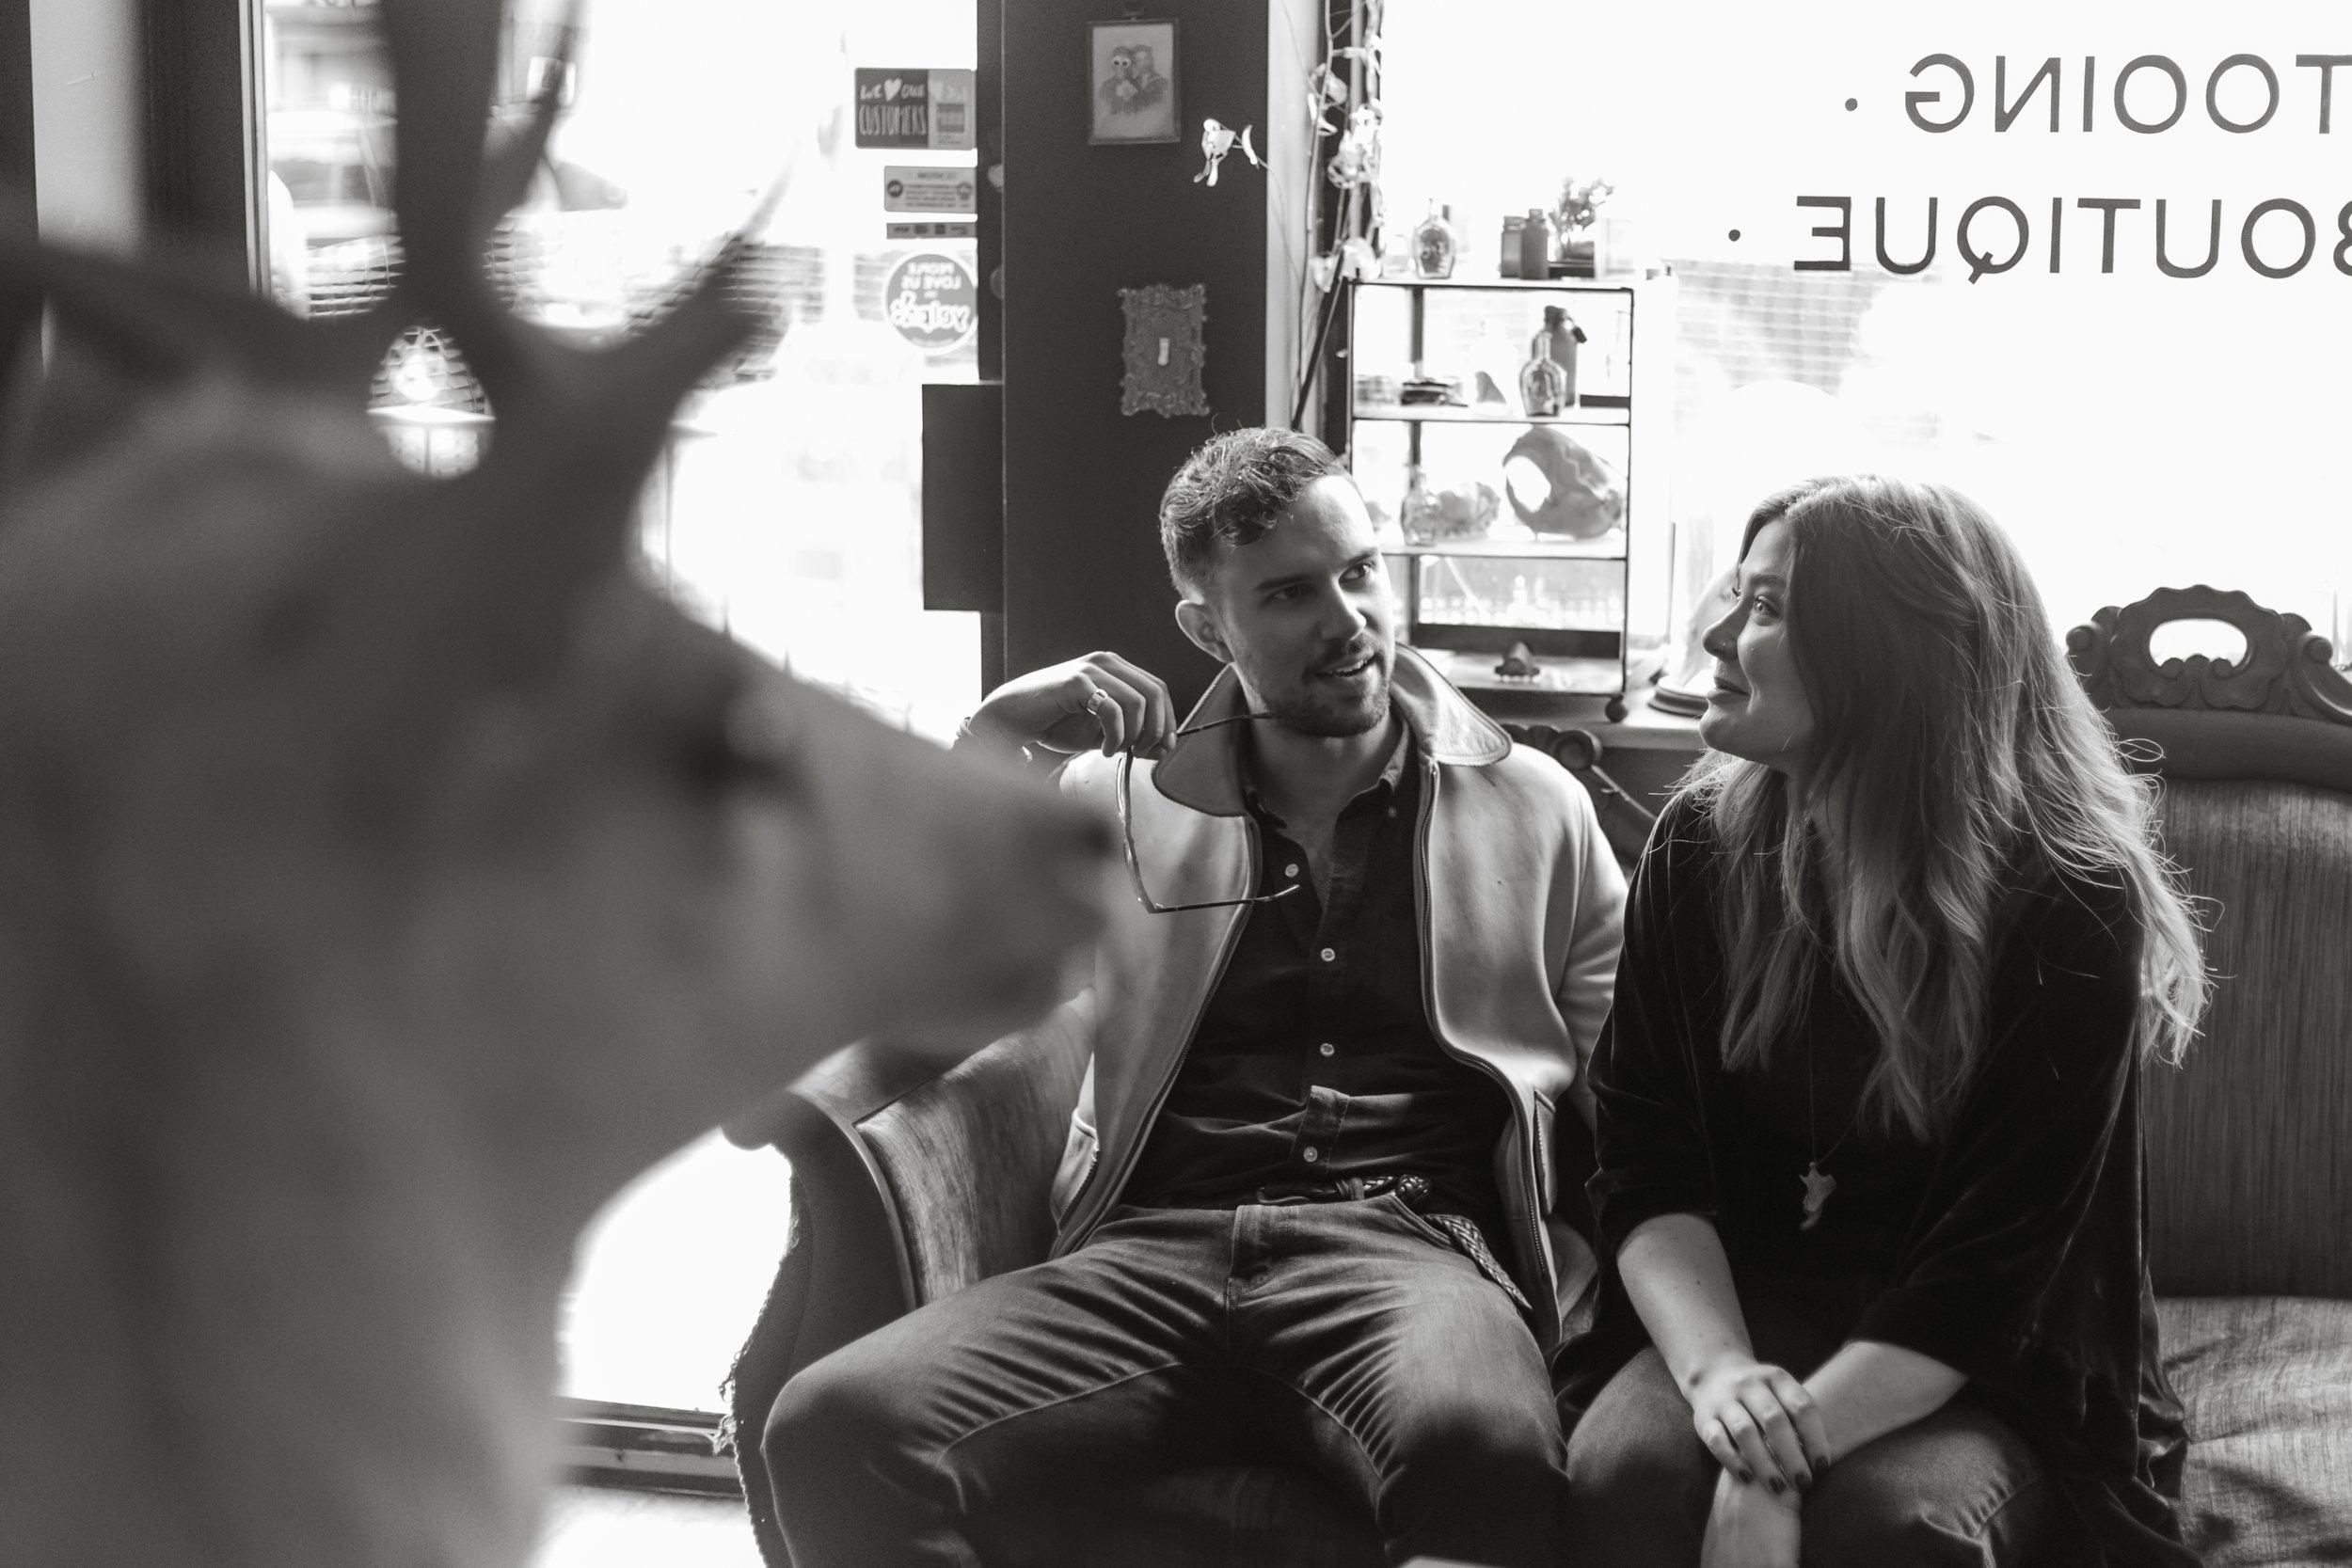 Kate-Alison-Photography-Gowanus-Brooklyn-Tattoo-Oddities-Shop-Engagement-Session